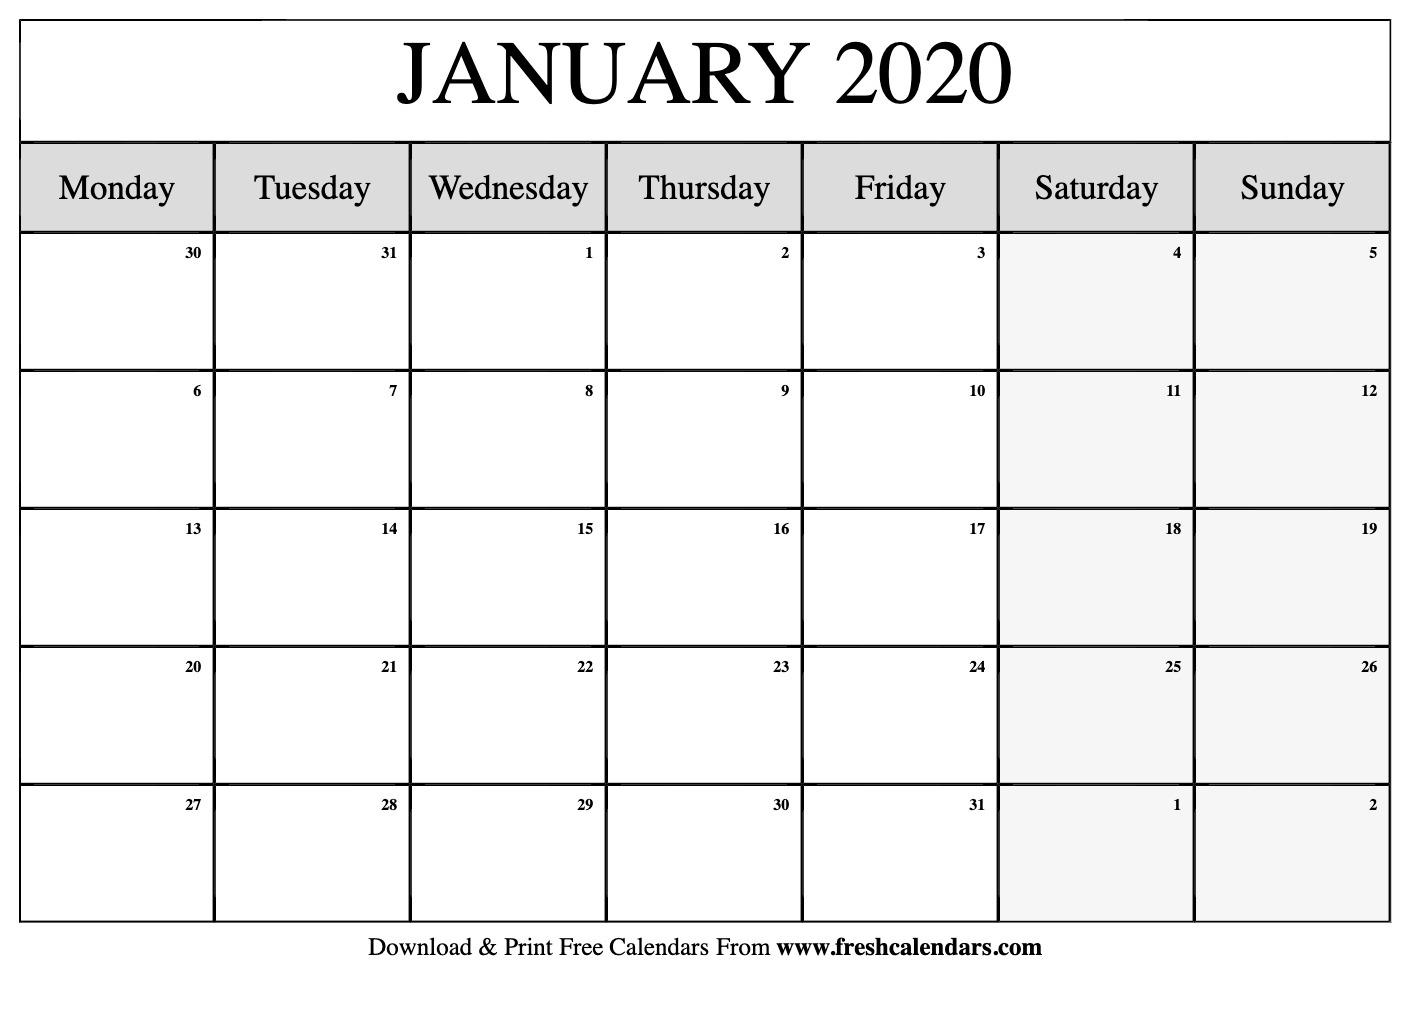 Free Printable January 2020 Calendar Remarkable 2020 Monthly Calendar Monday Start